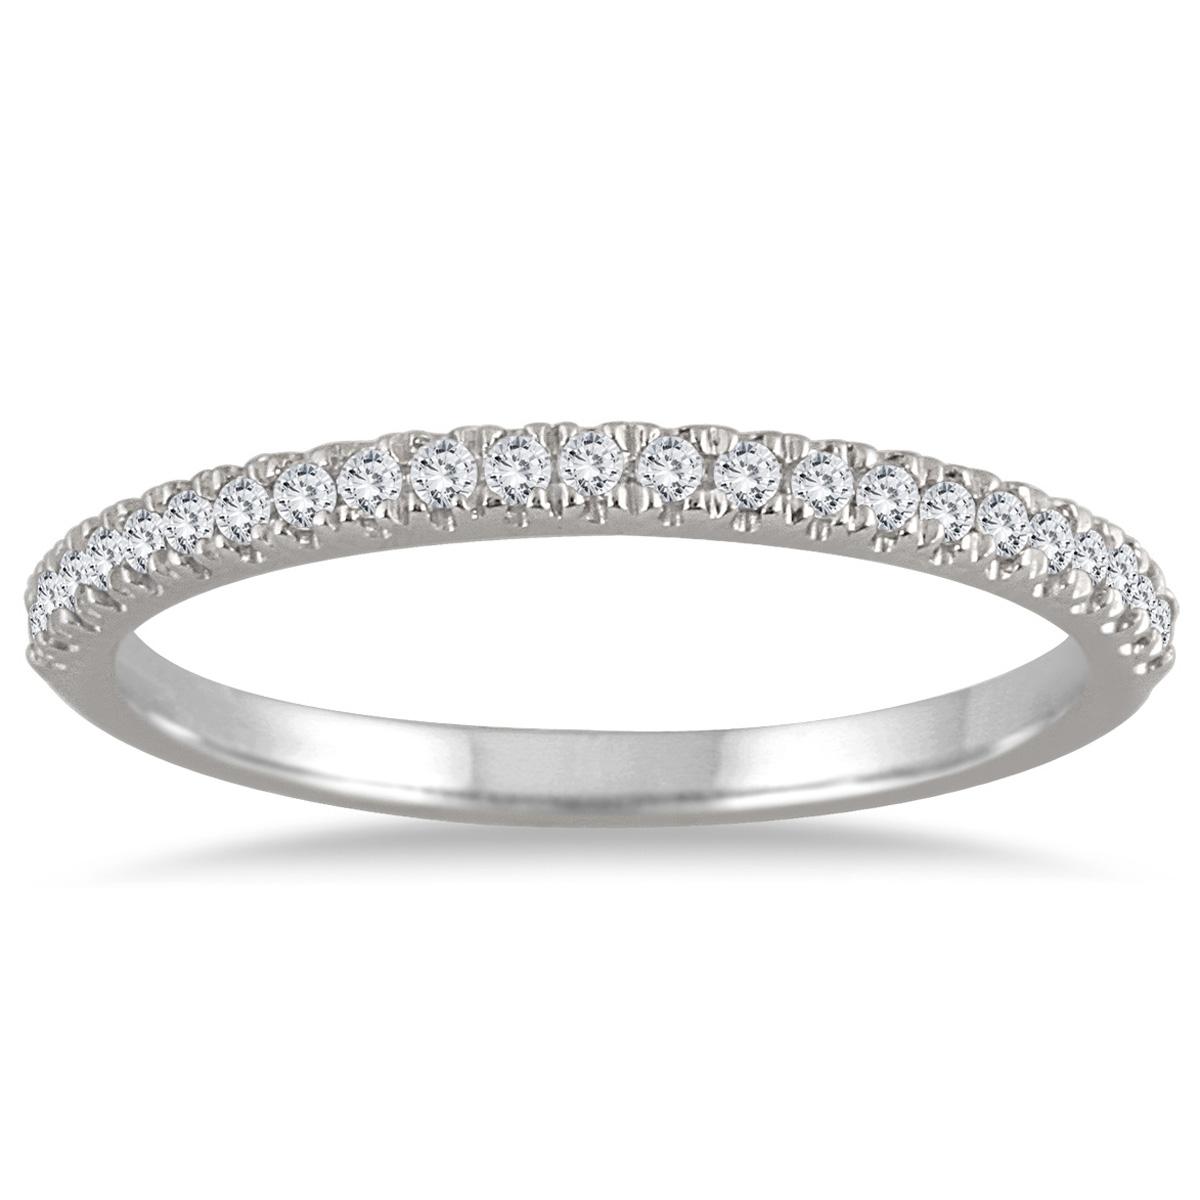 1/6 Carat TW Diamond...